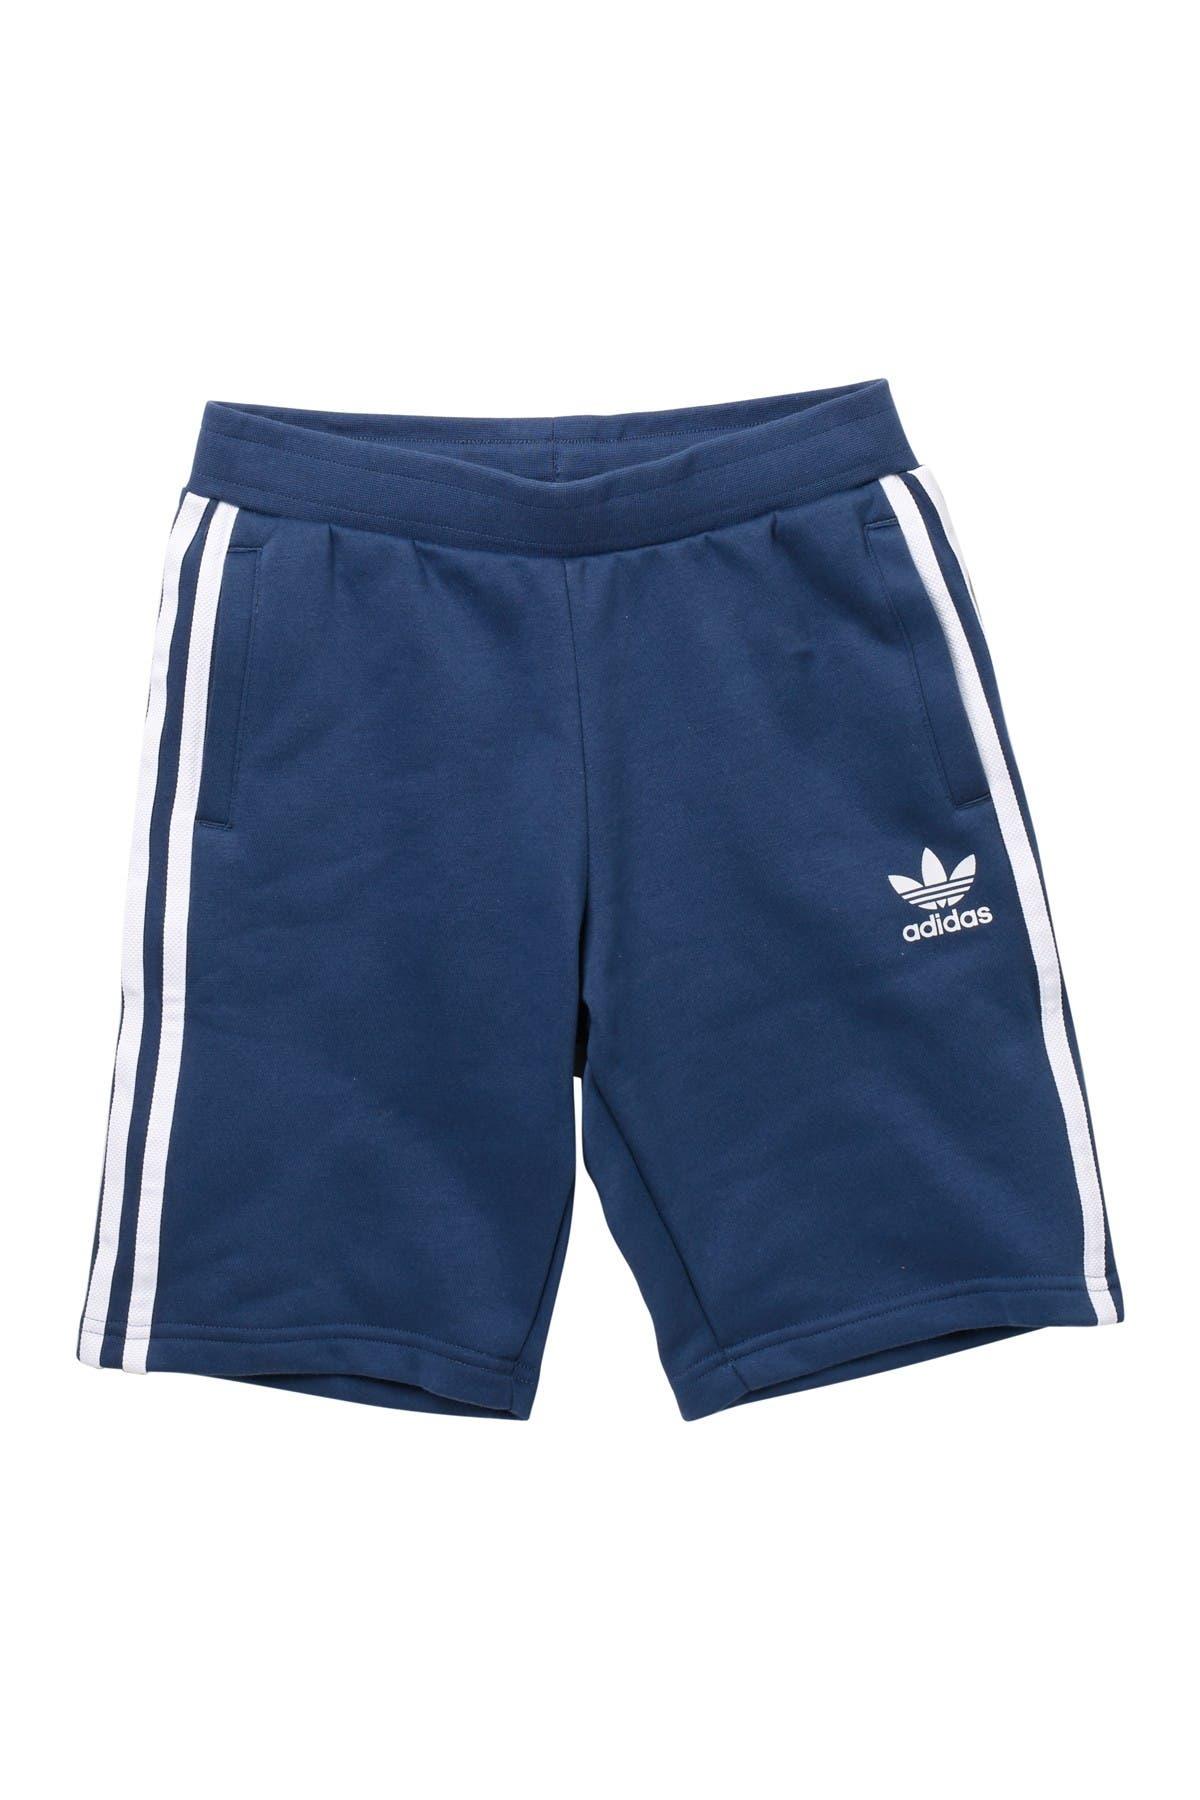 Image of ADIDAS ORIGINALS 3 Stripe Fleece Shorts